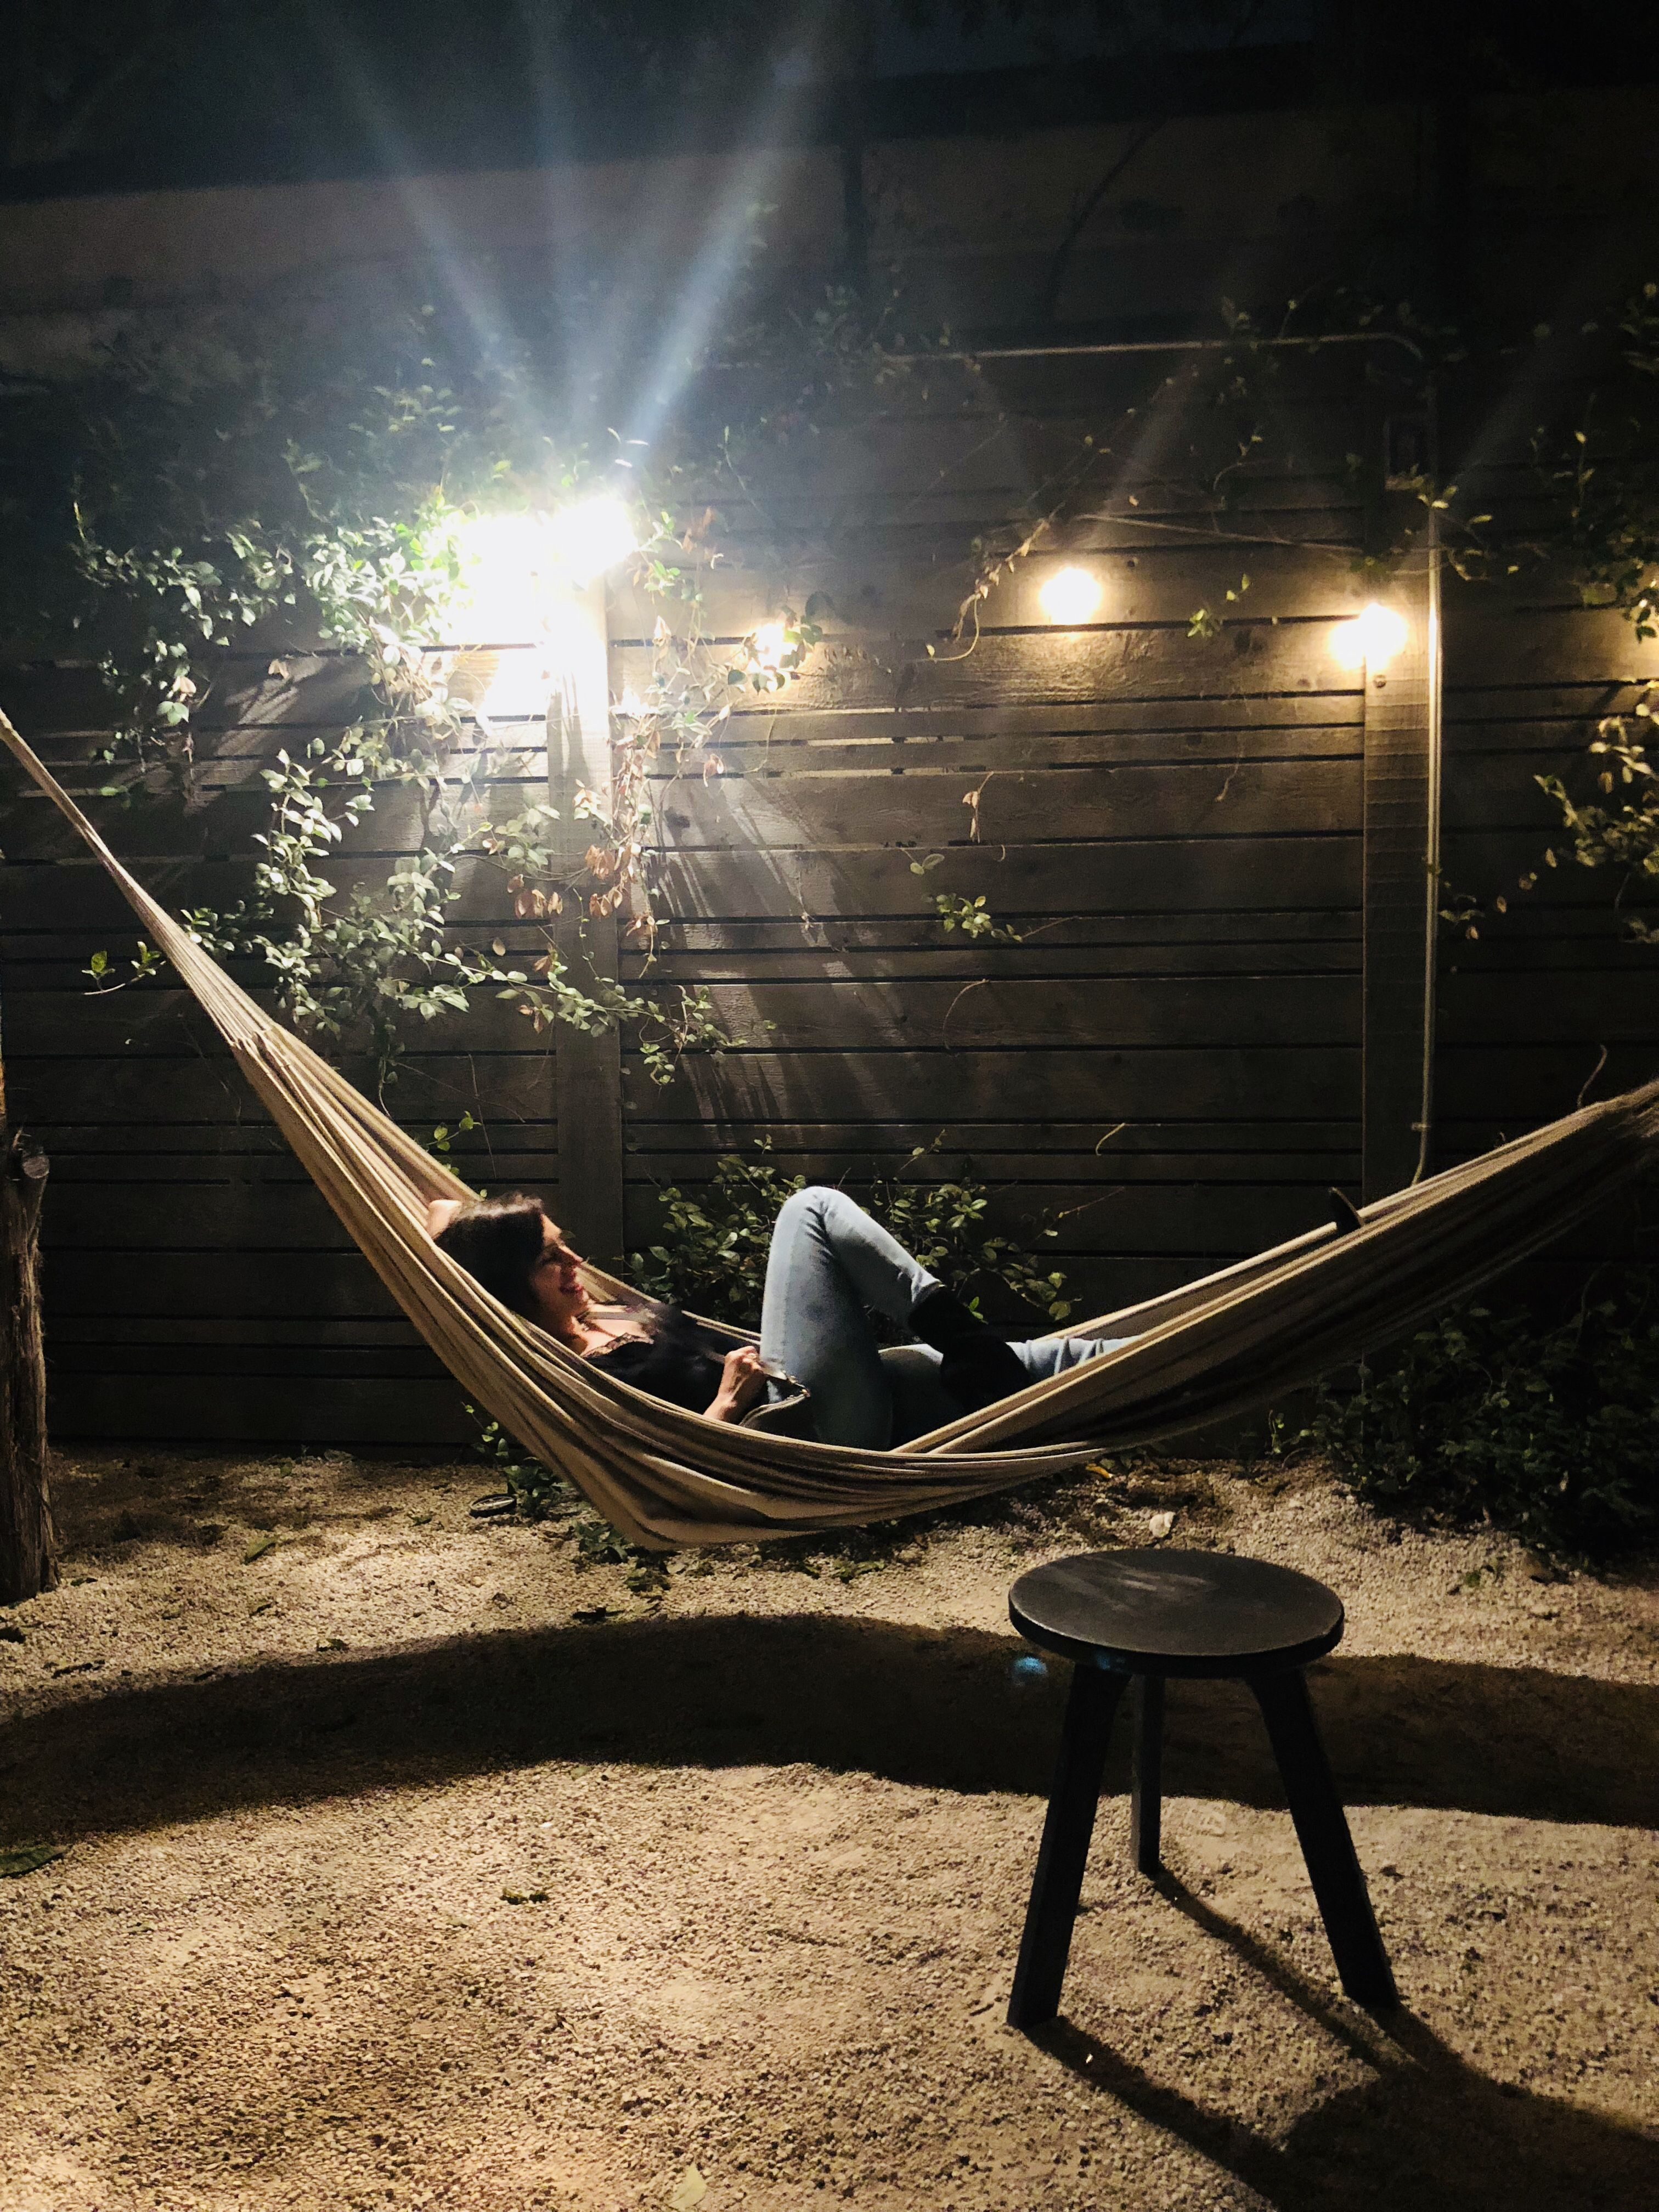 Date night hammocks mom humor parenting hacks travel